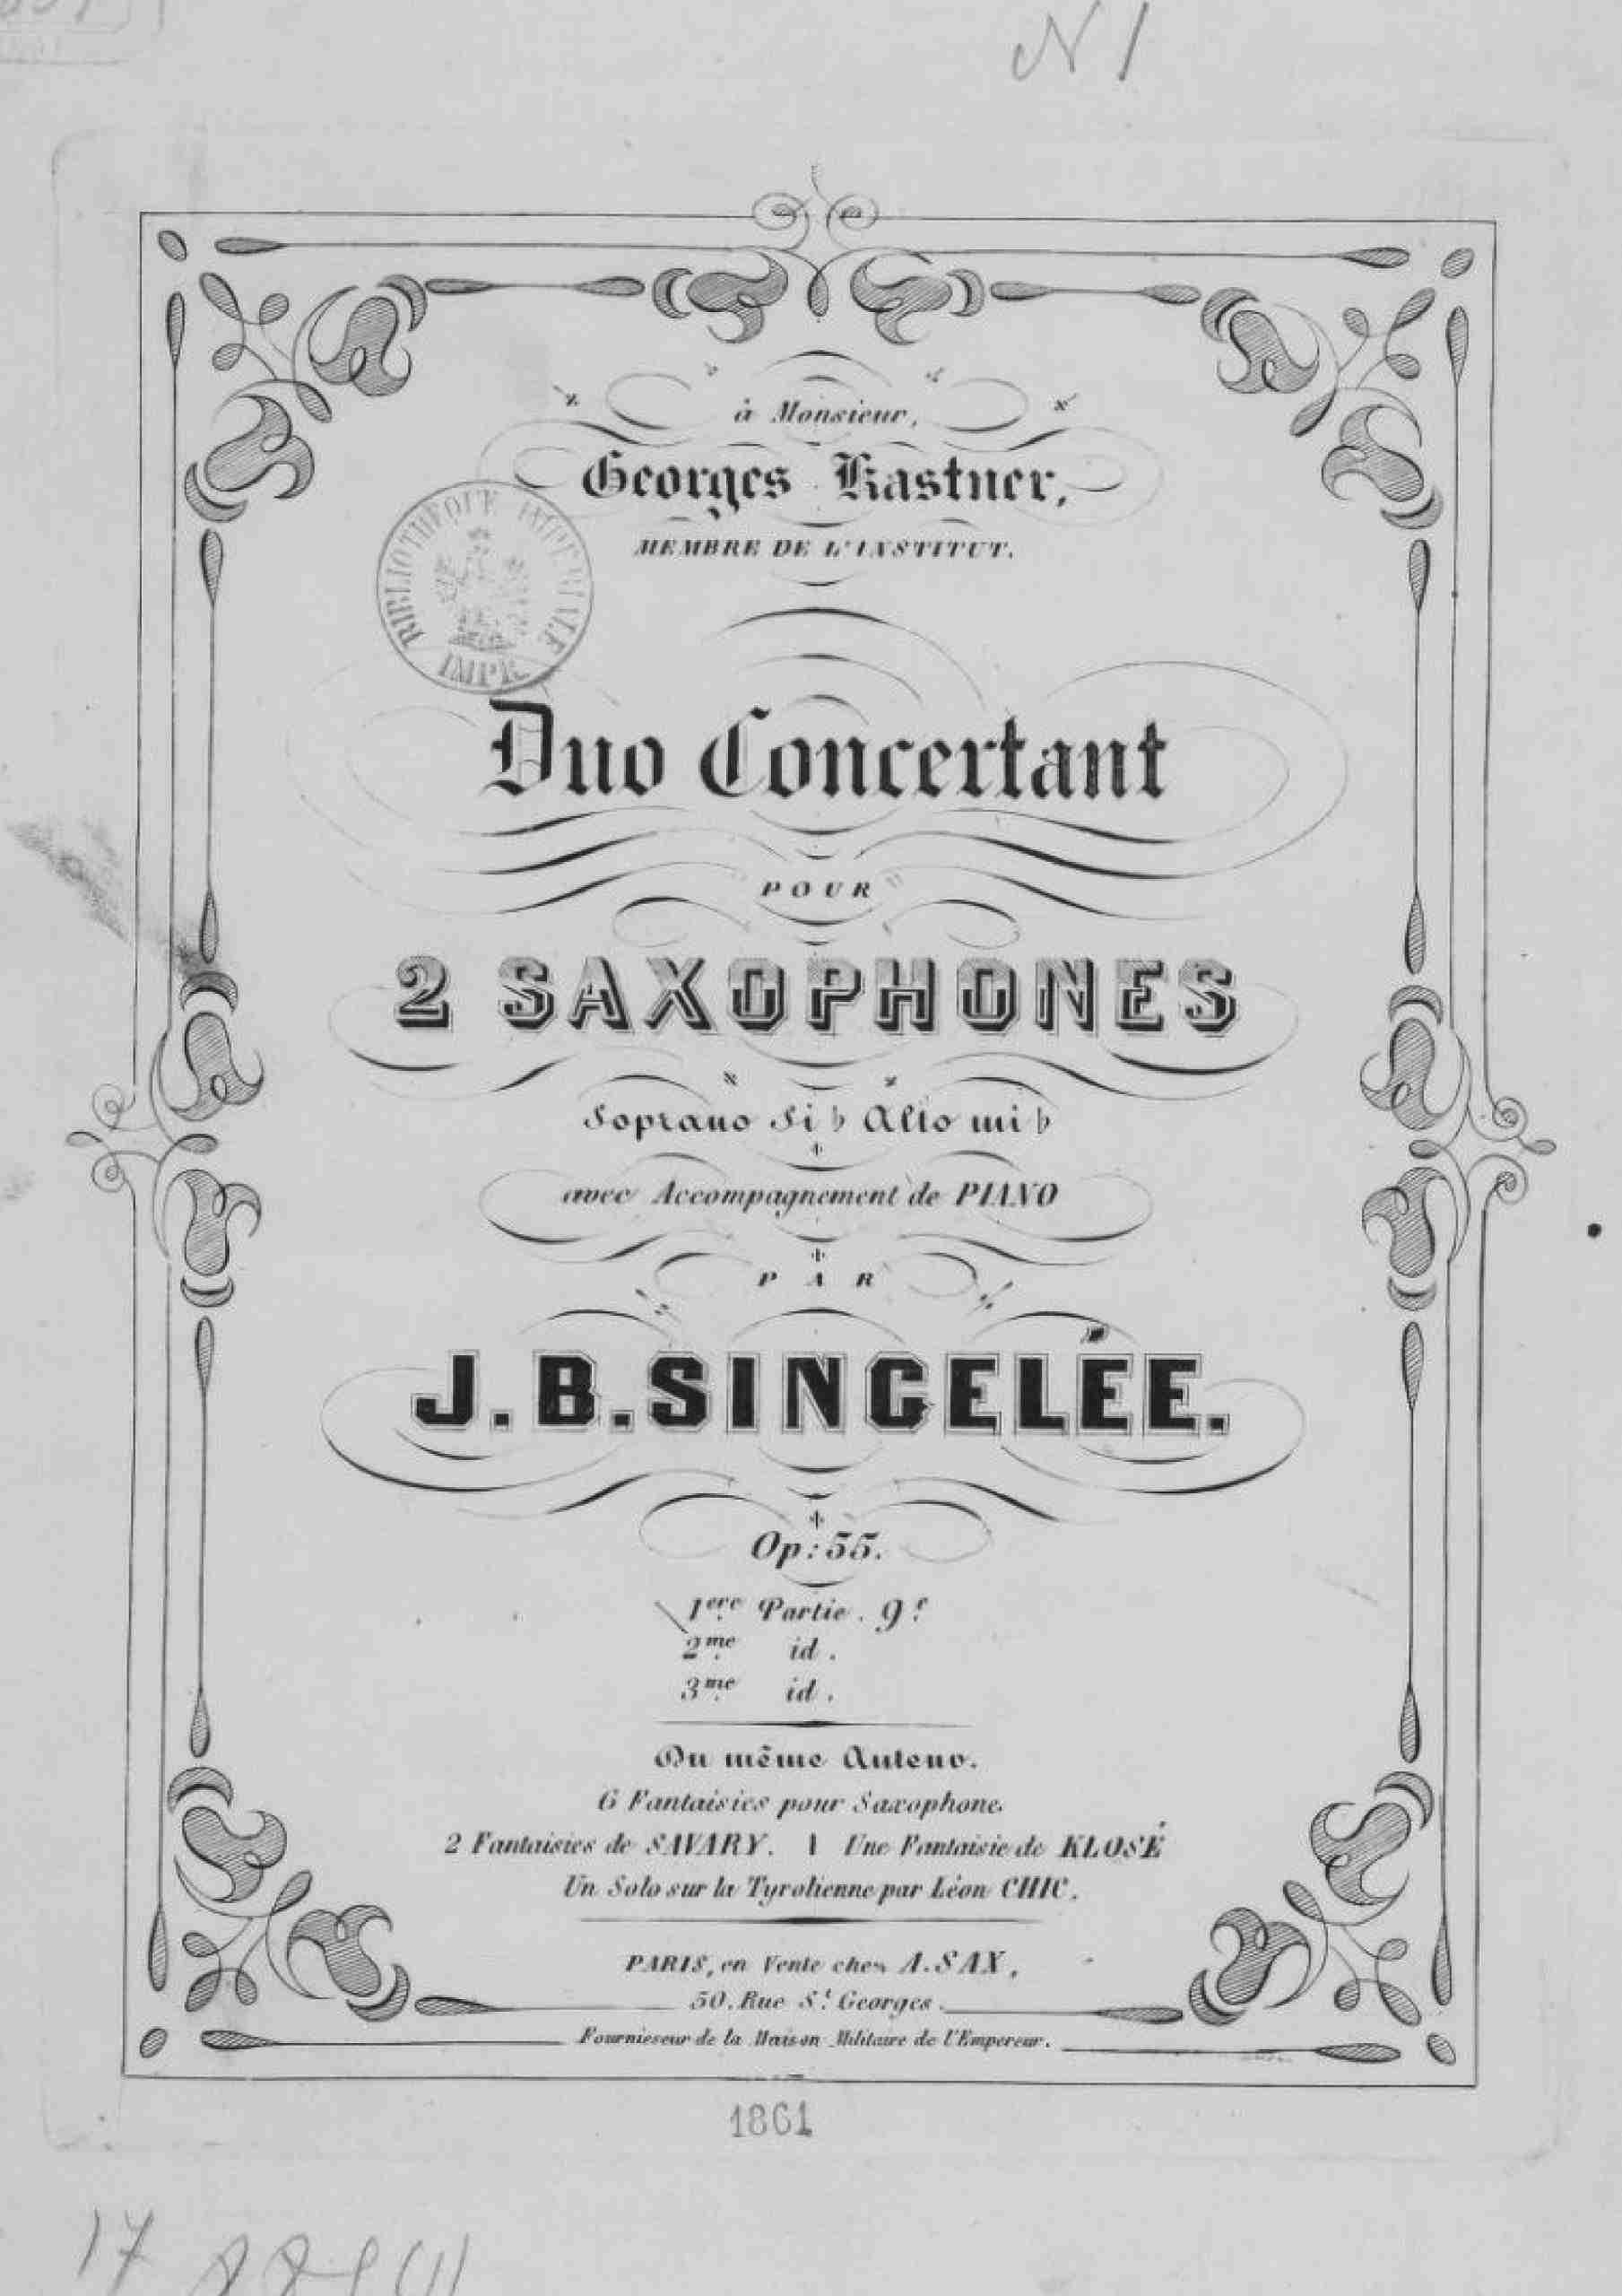 Singelée, Jean Baptiste - Duo concertant, Op.55